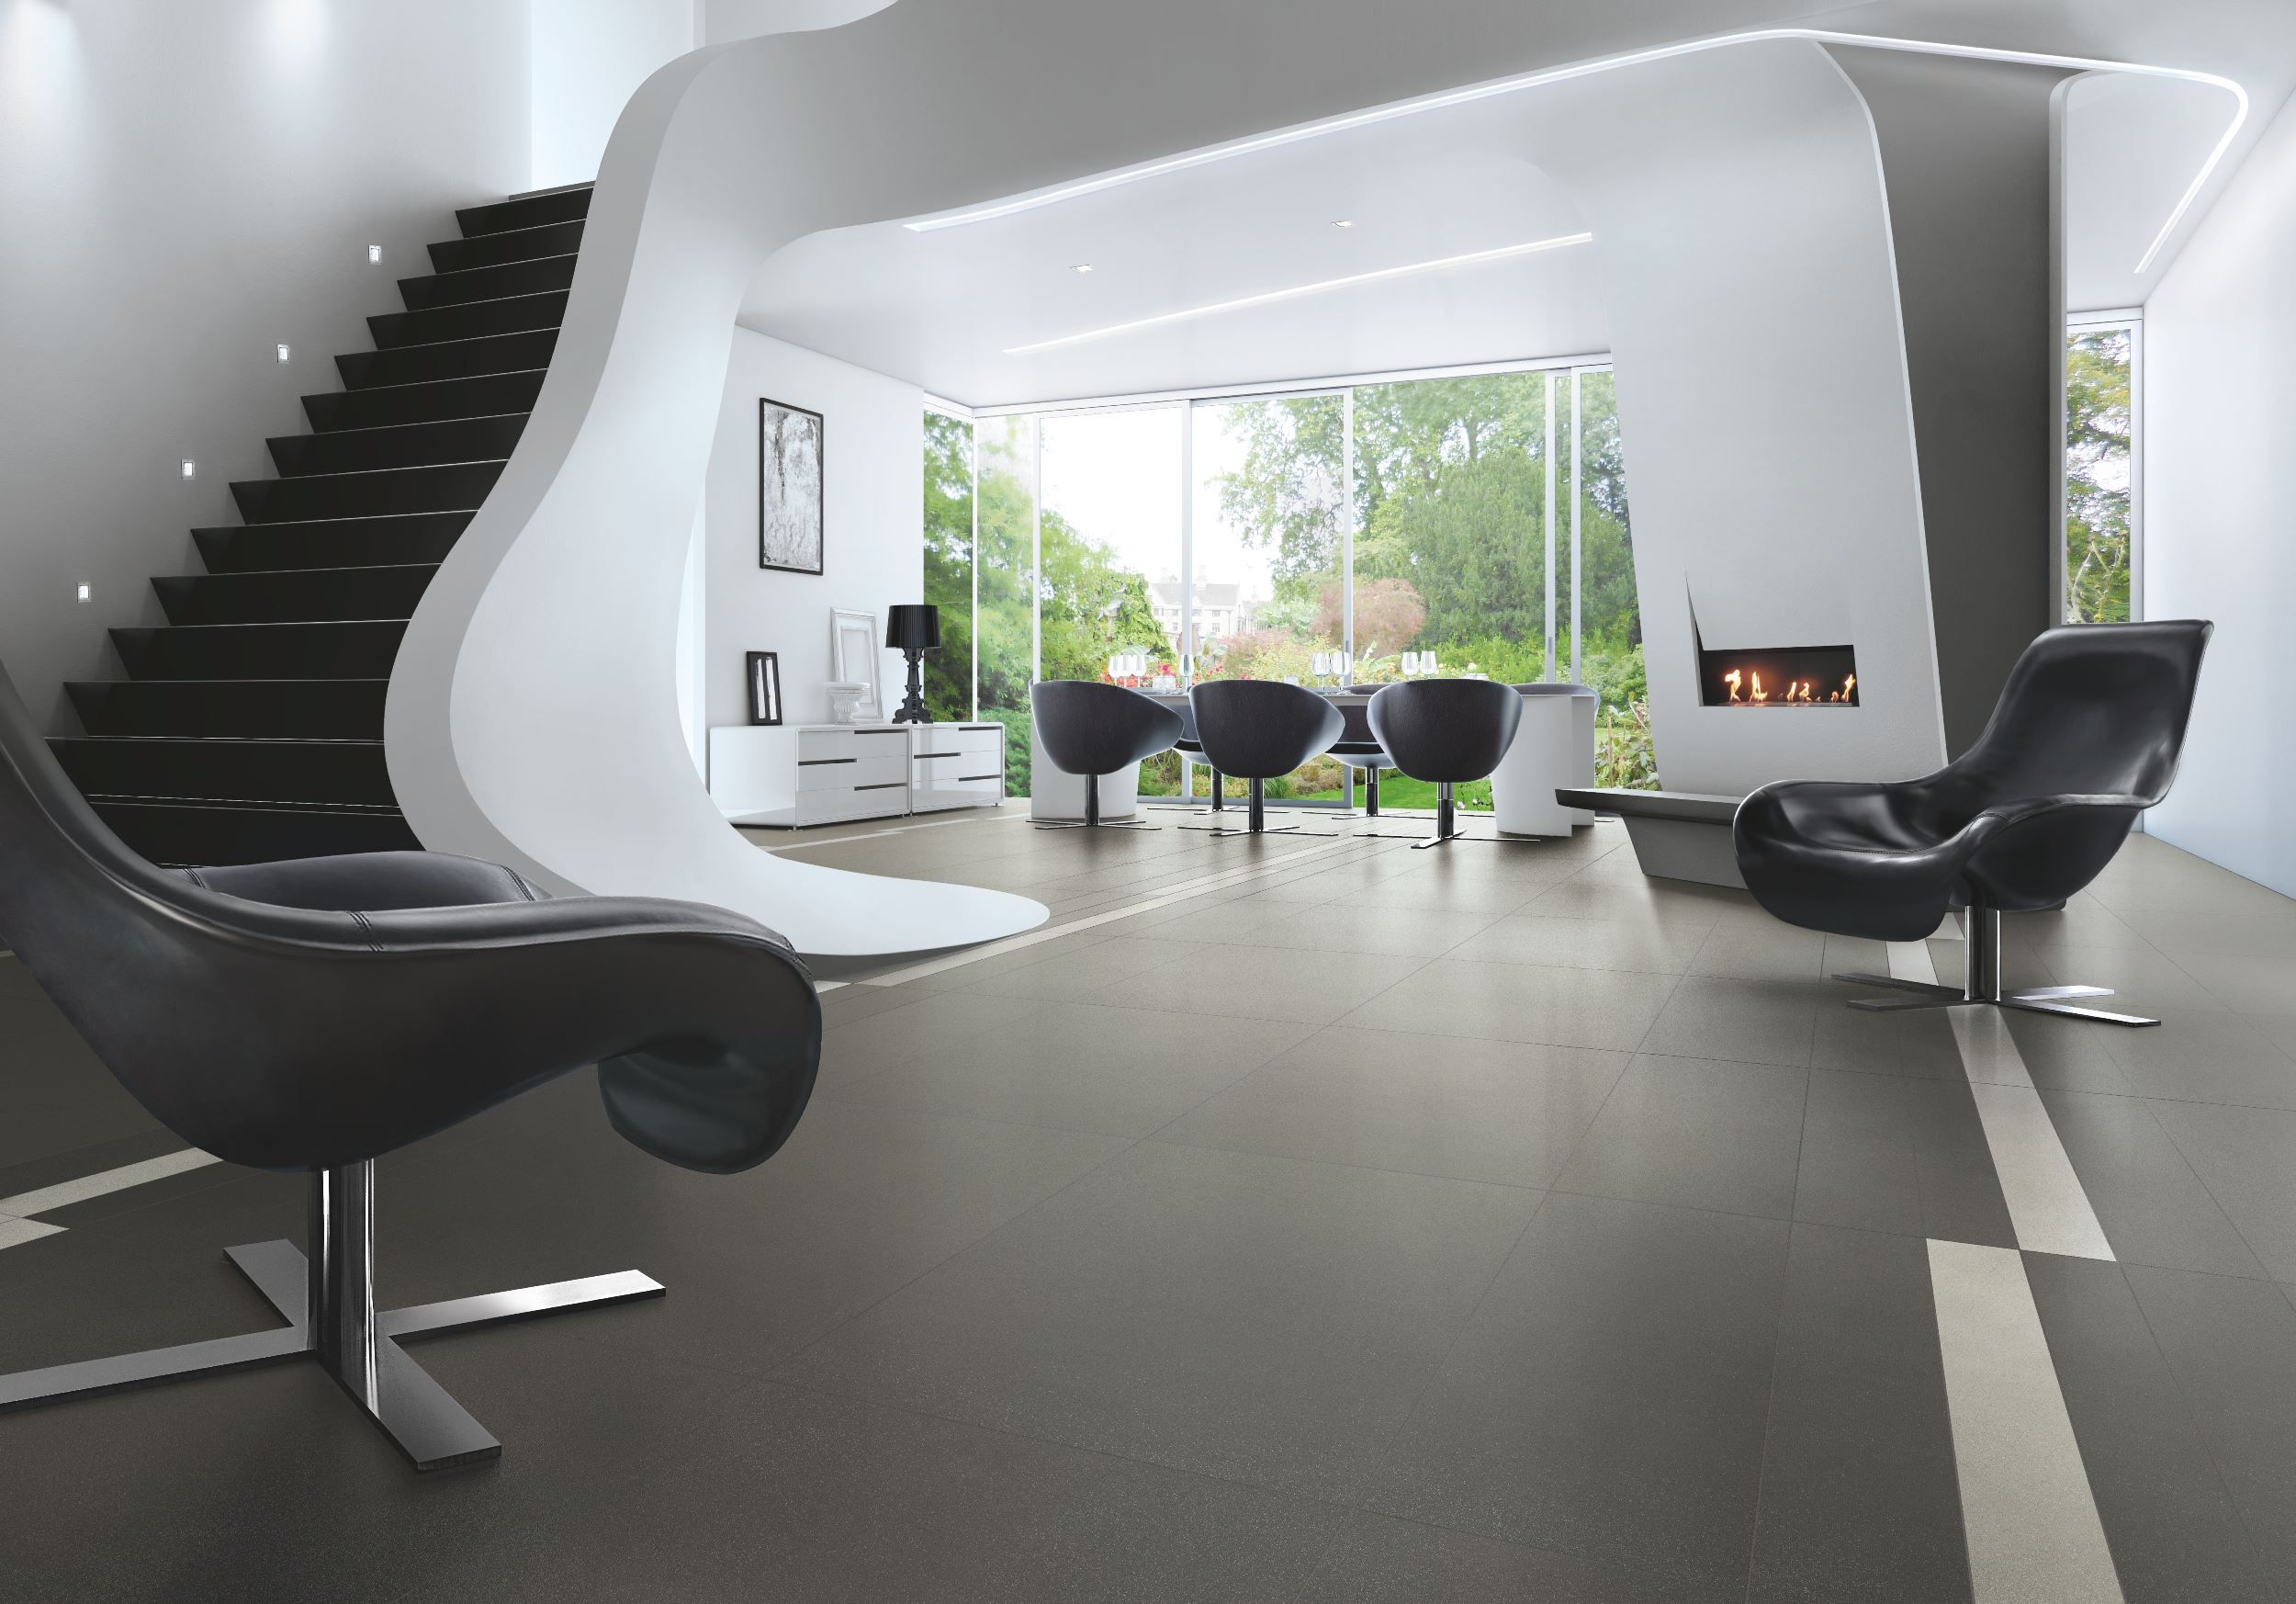 Home holl innenarchitektur pin by archello on elements floors in   pinterest  flooring